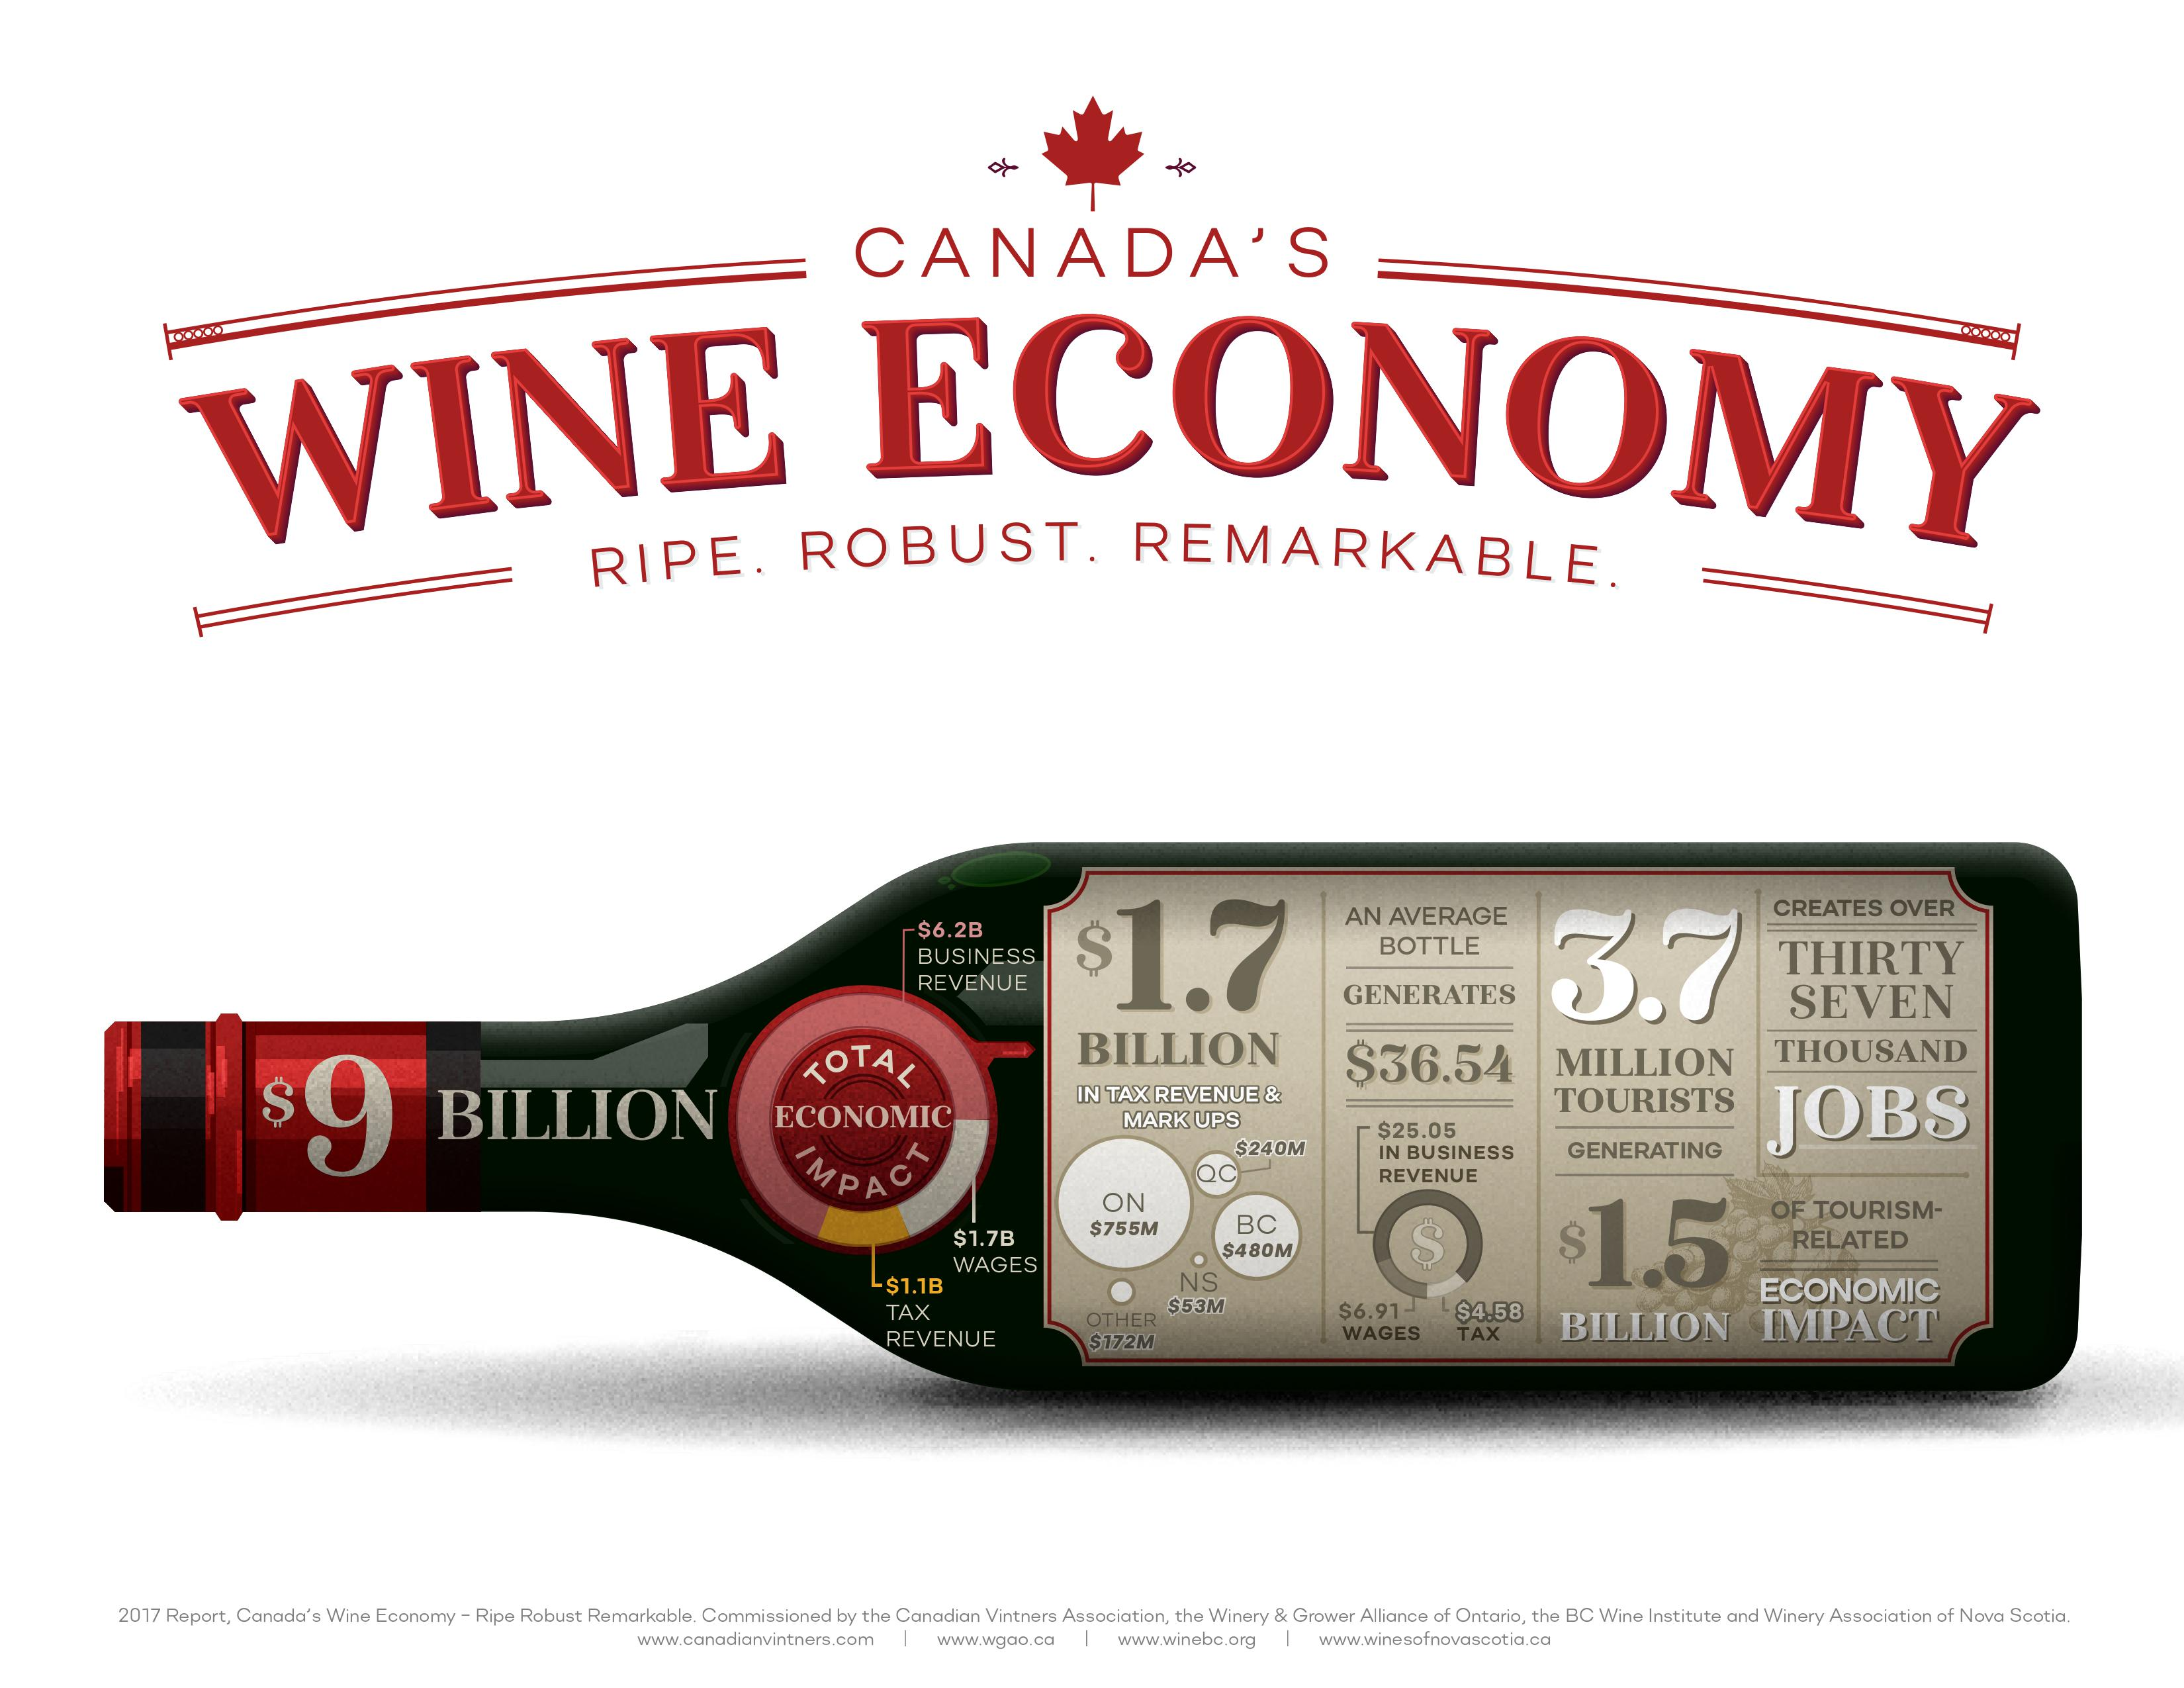 Canadian_Vintners_Economic_Impact_Infographic-d20f0a947e9e81058f111c85e2270bbf